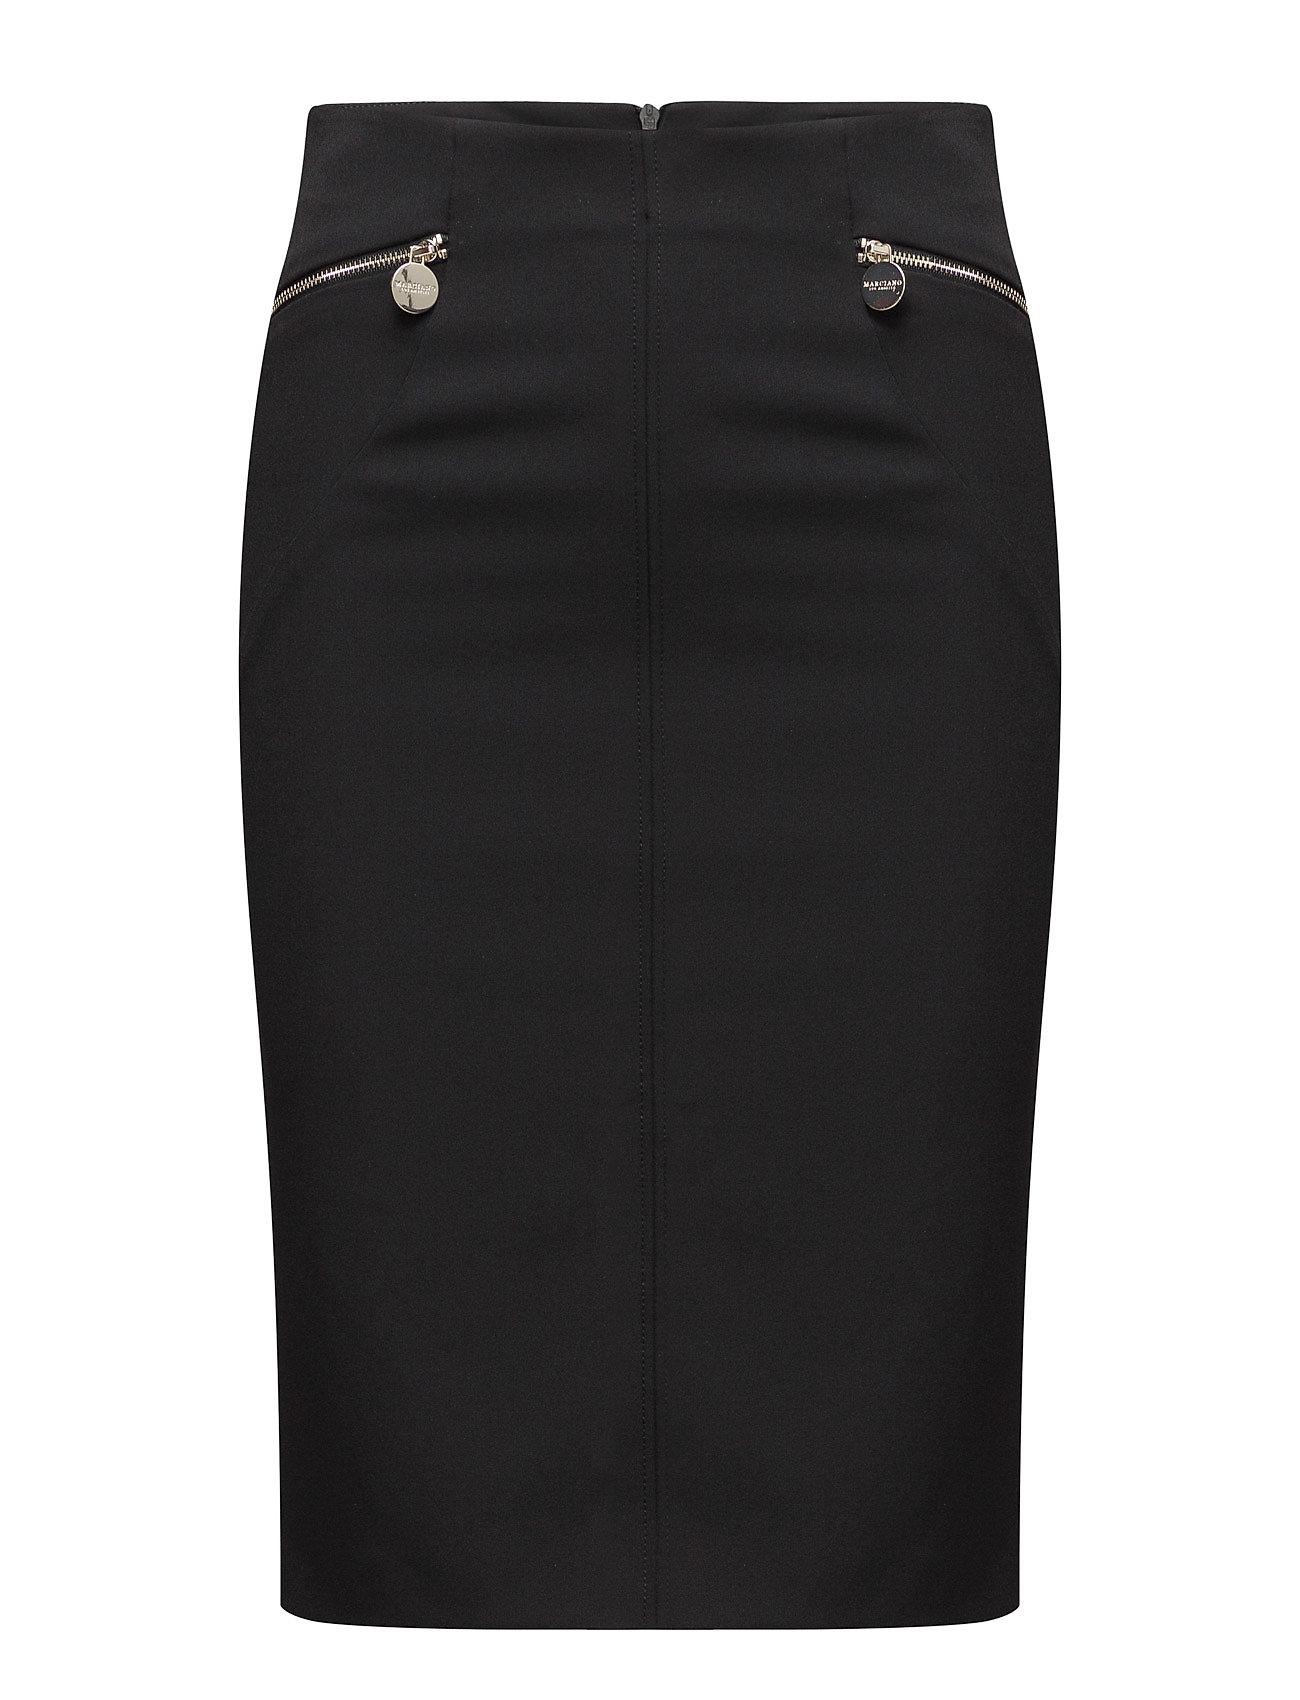 Longuette Zipper Skirt Marciano by GUESS Nederdele til Kvinder i